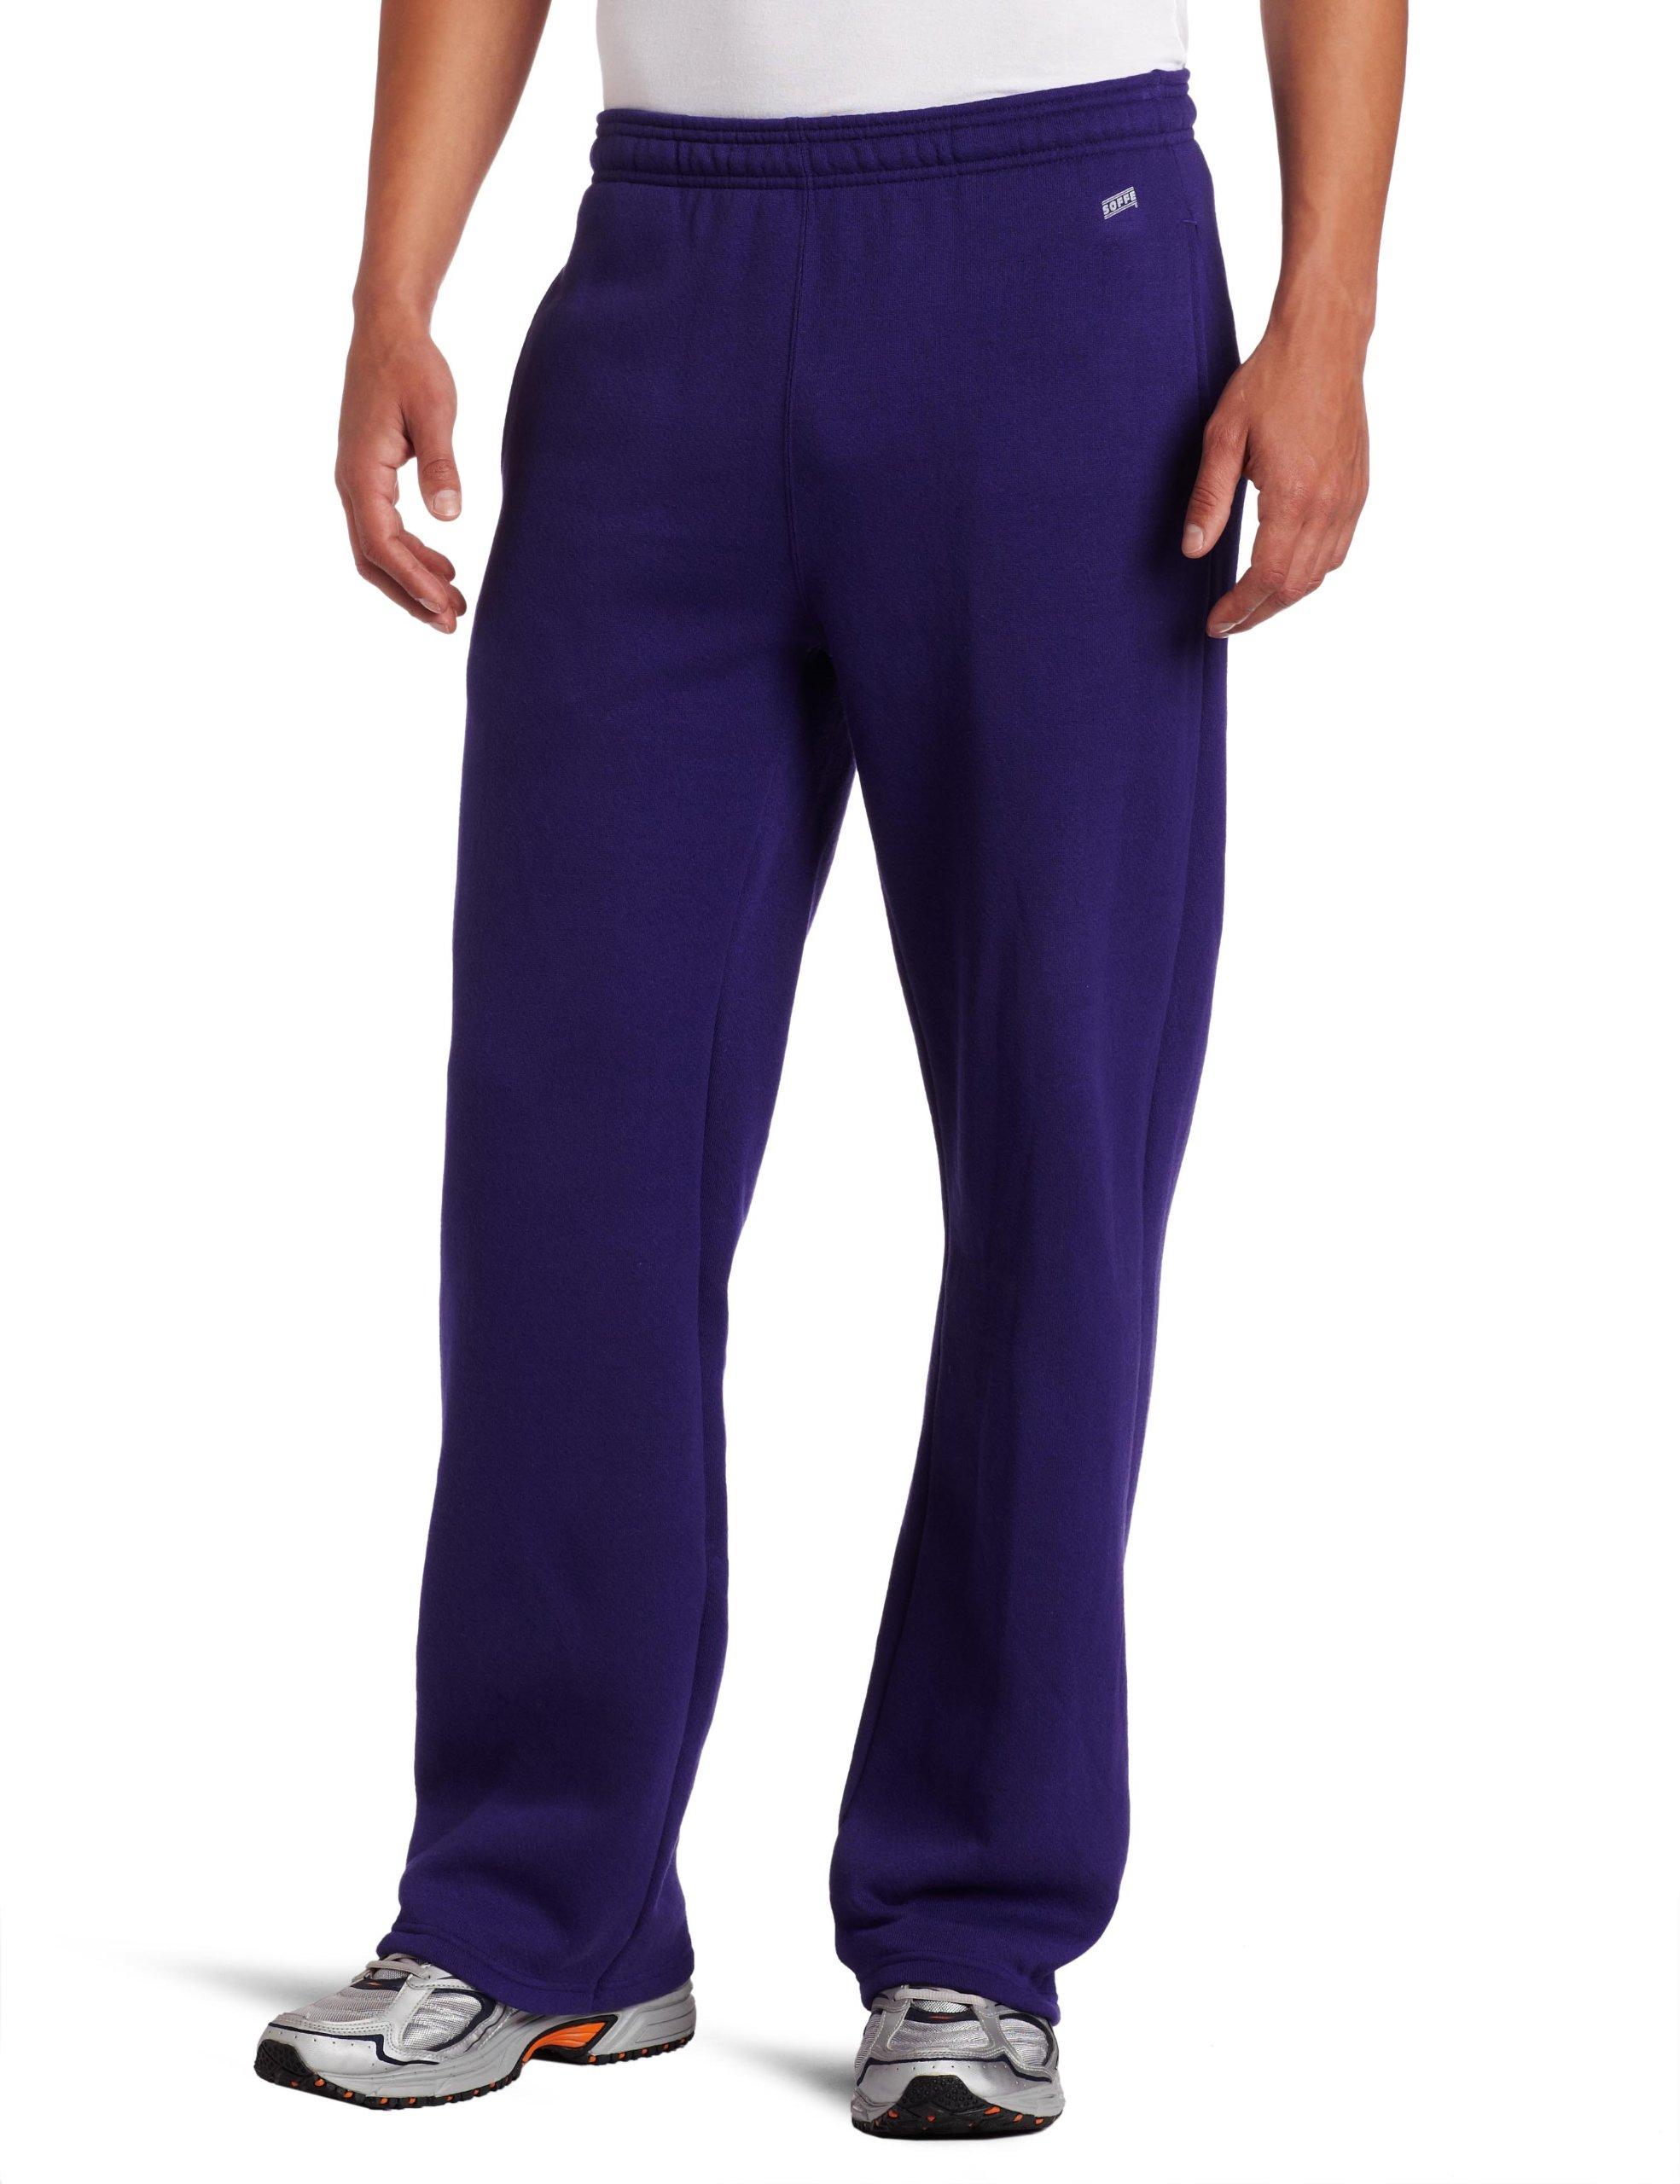 Soffe MJ Men's Training Fleece Pocket Pant, Purple, Small